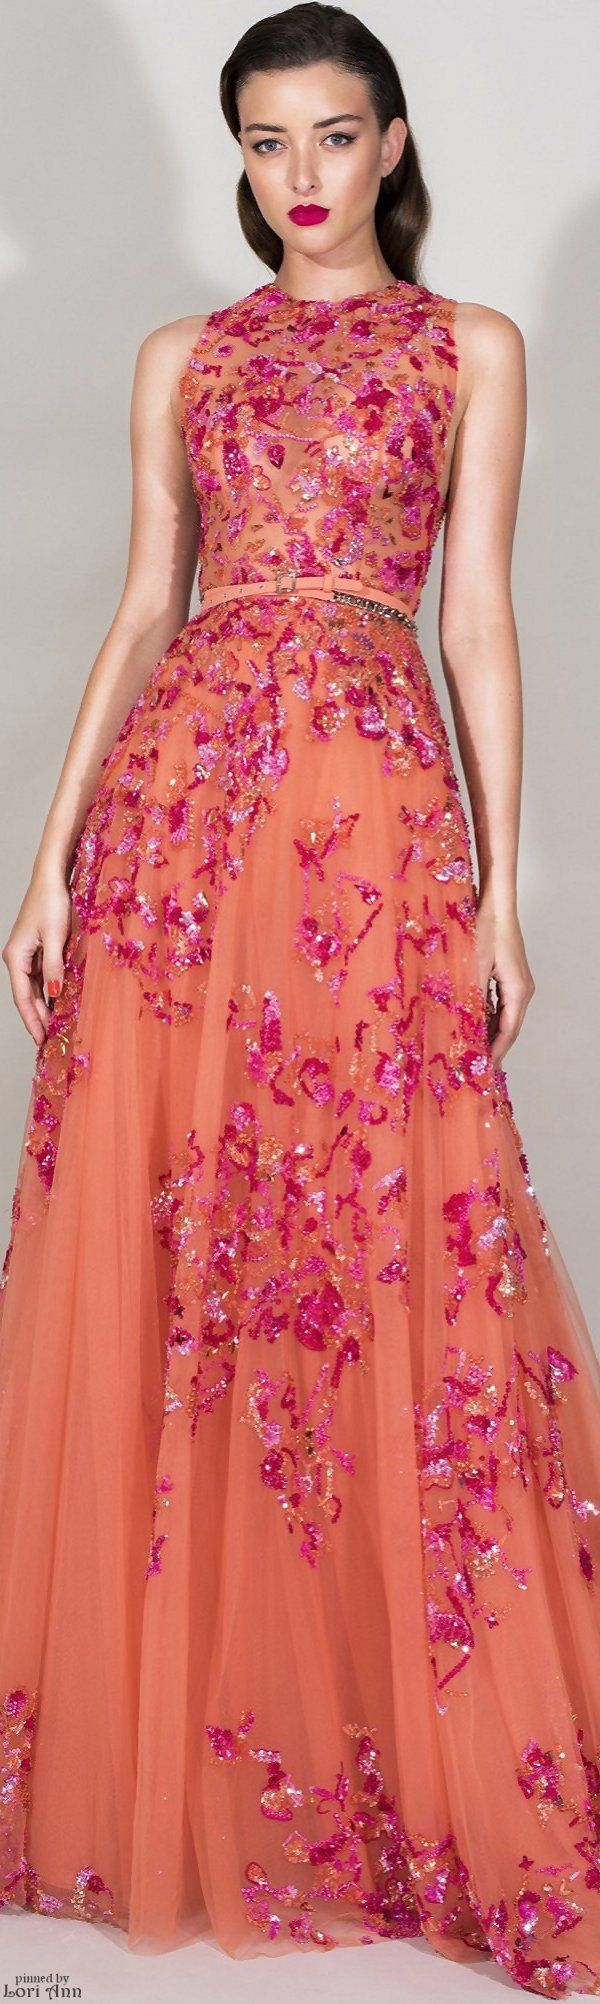 313 mejores imágenes en Dresses en Pinterest   Vestidos de noche ...